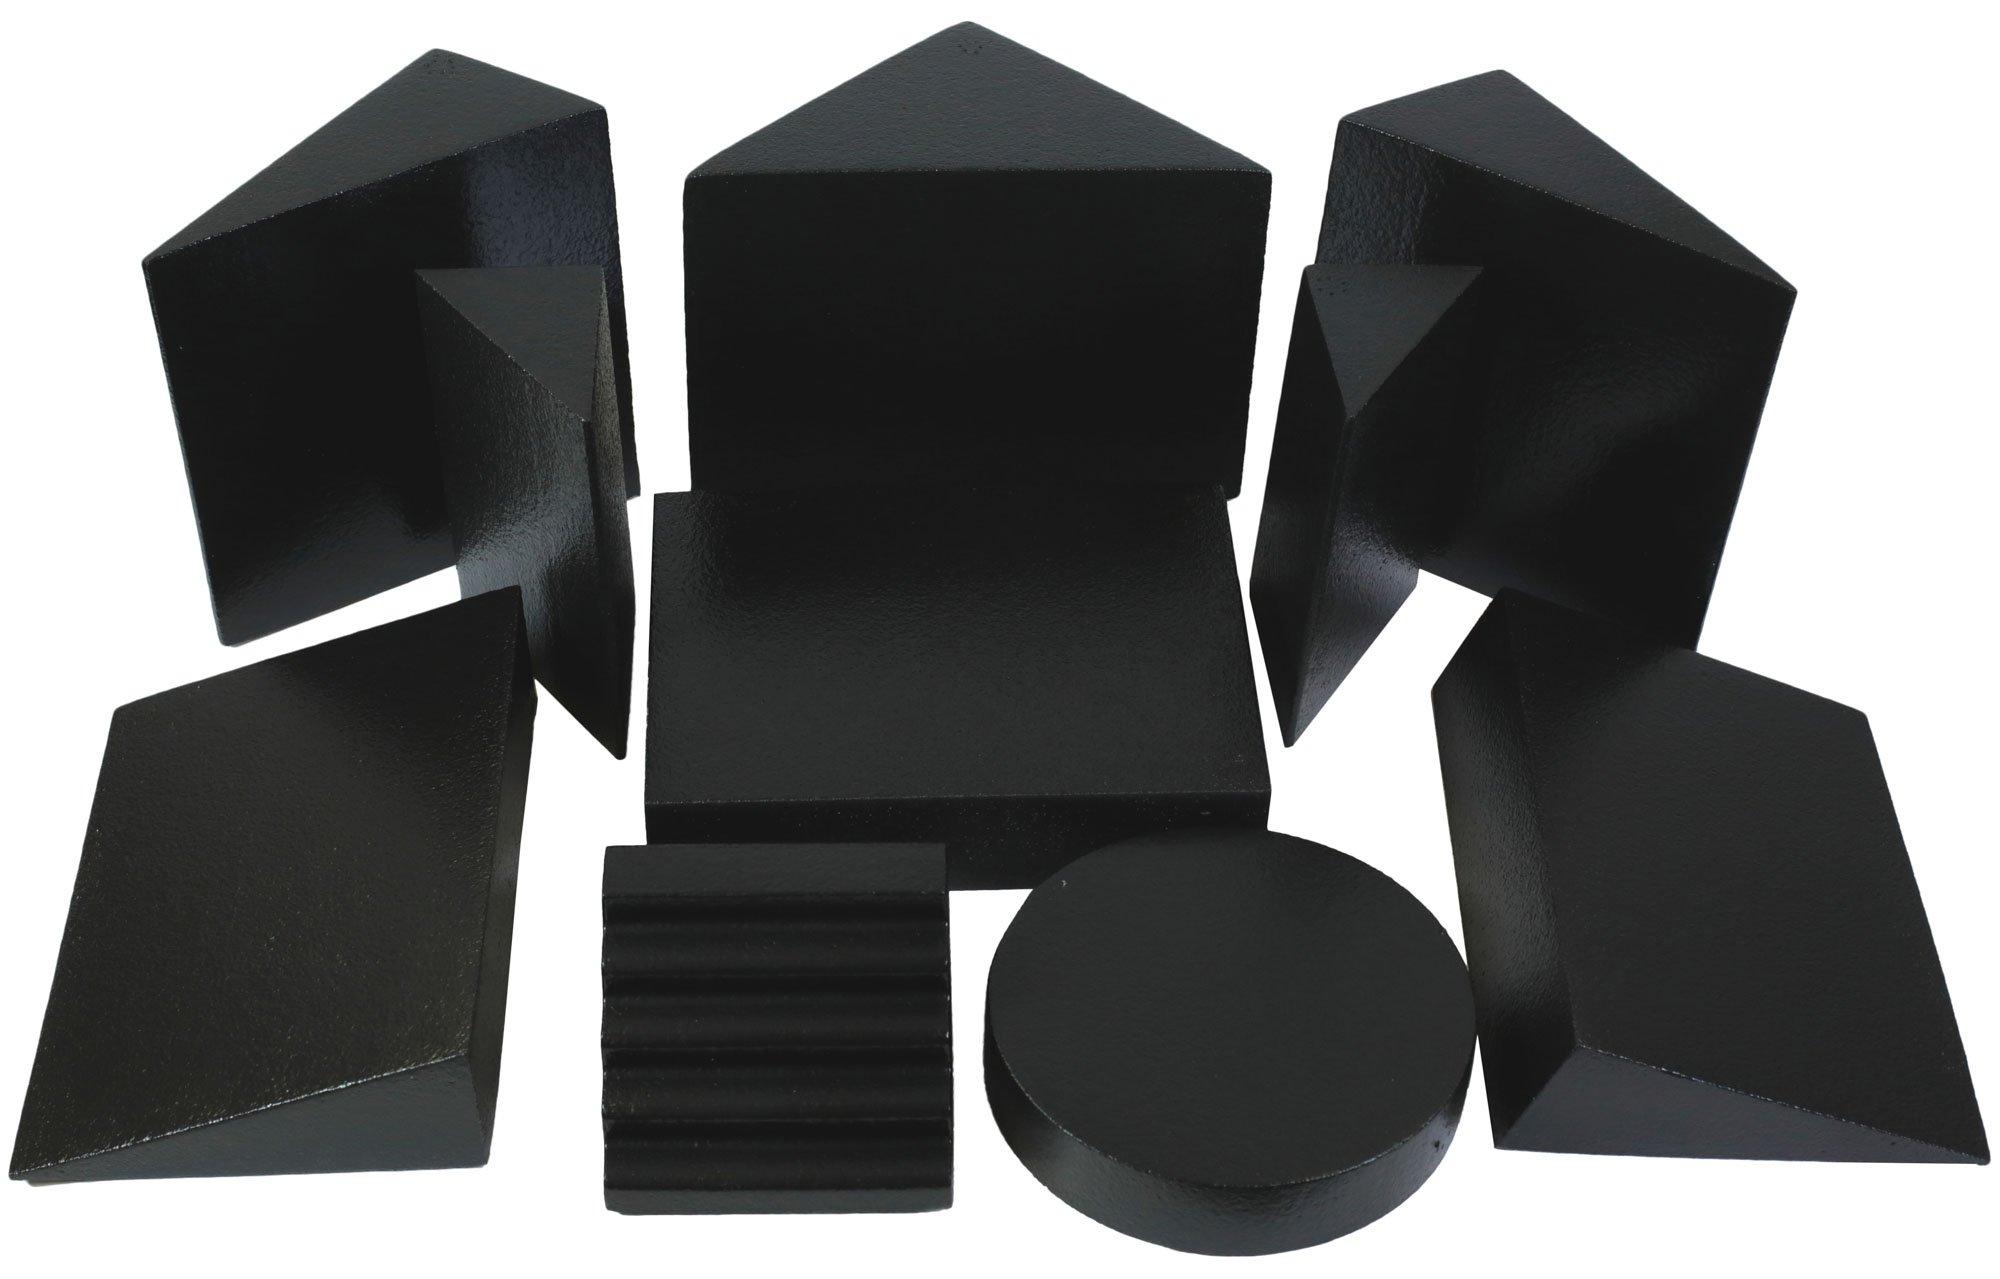 Routine X-Ray Positioning Kit - ScanCoat Black